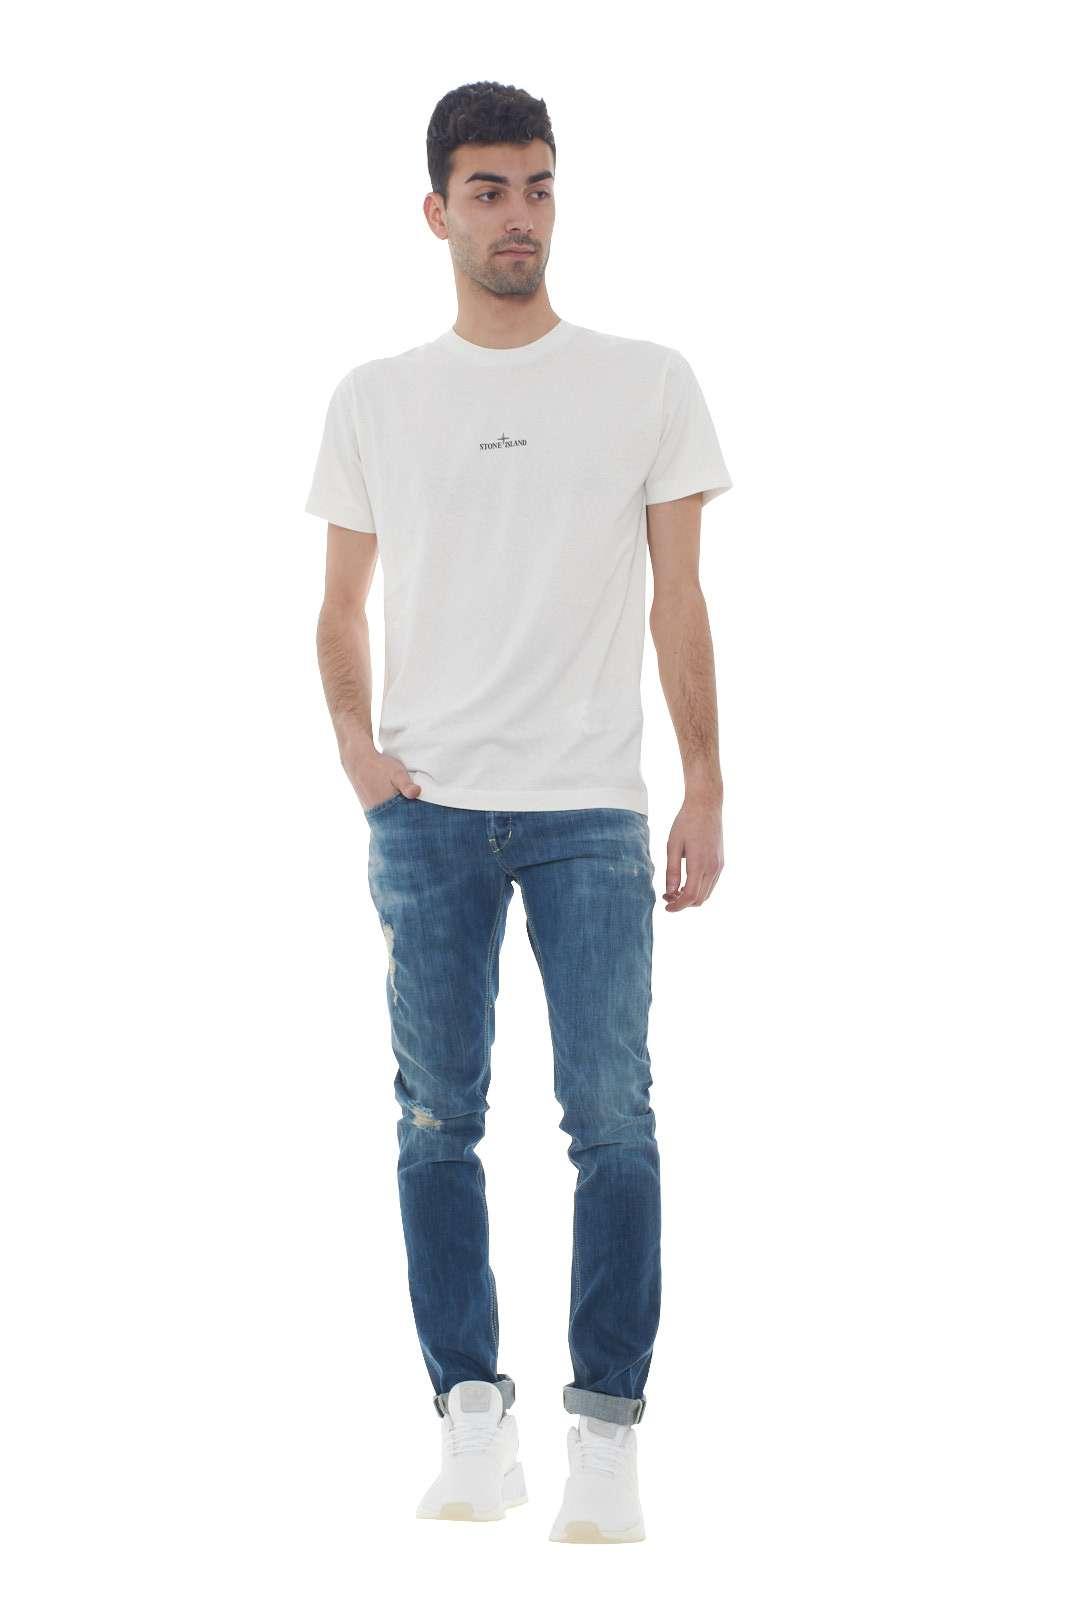 https://www.parmax.com/media/catalog/product/a/i/PE-outlet_parmax-t-shirt-uomo-Stone-Island-72152ns84-D.jpg